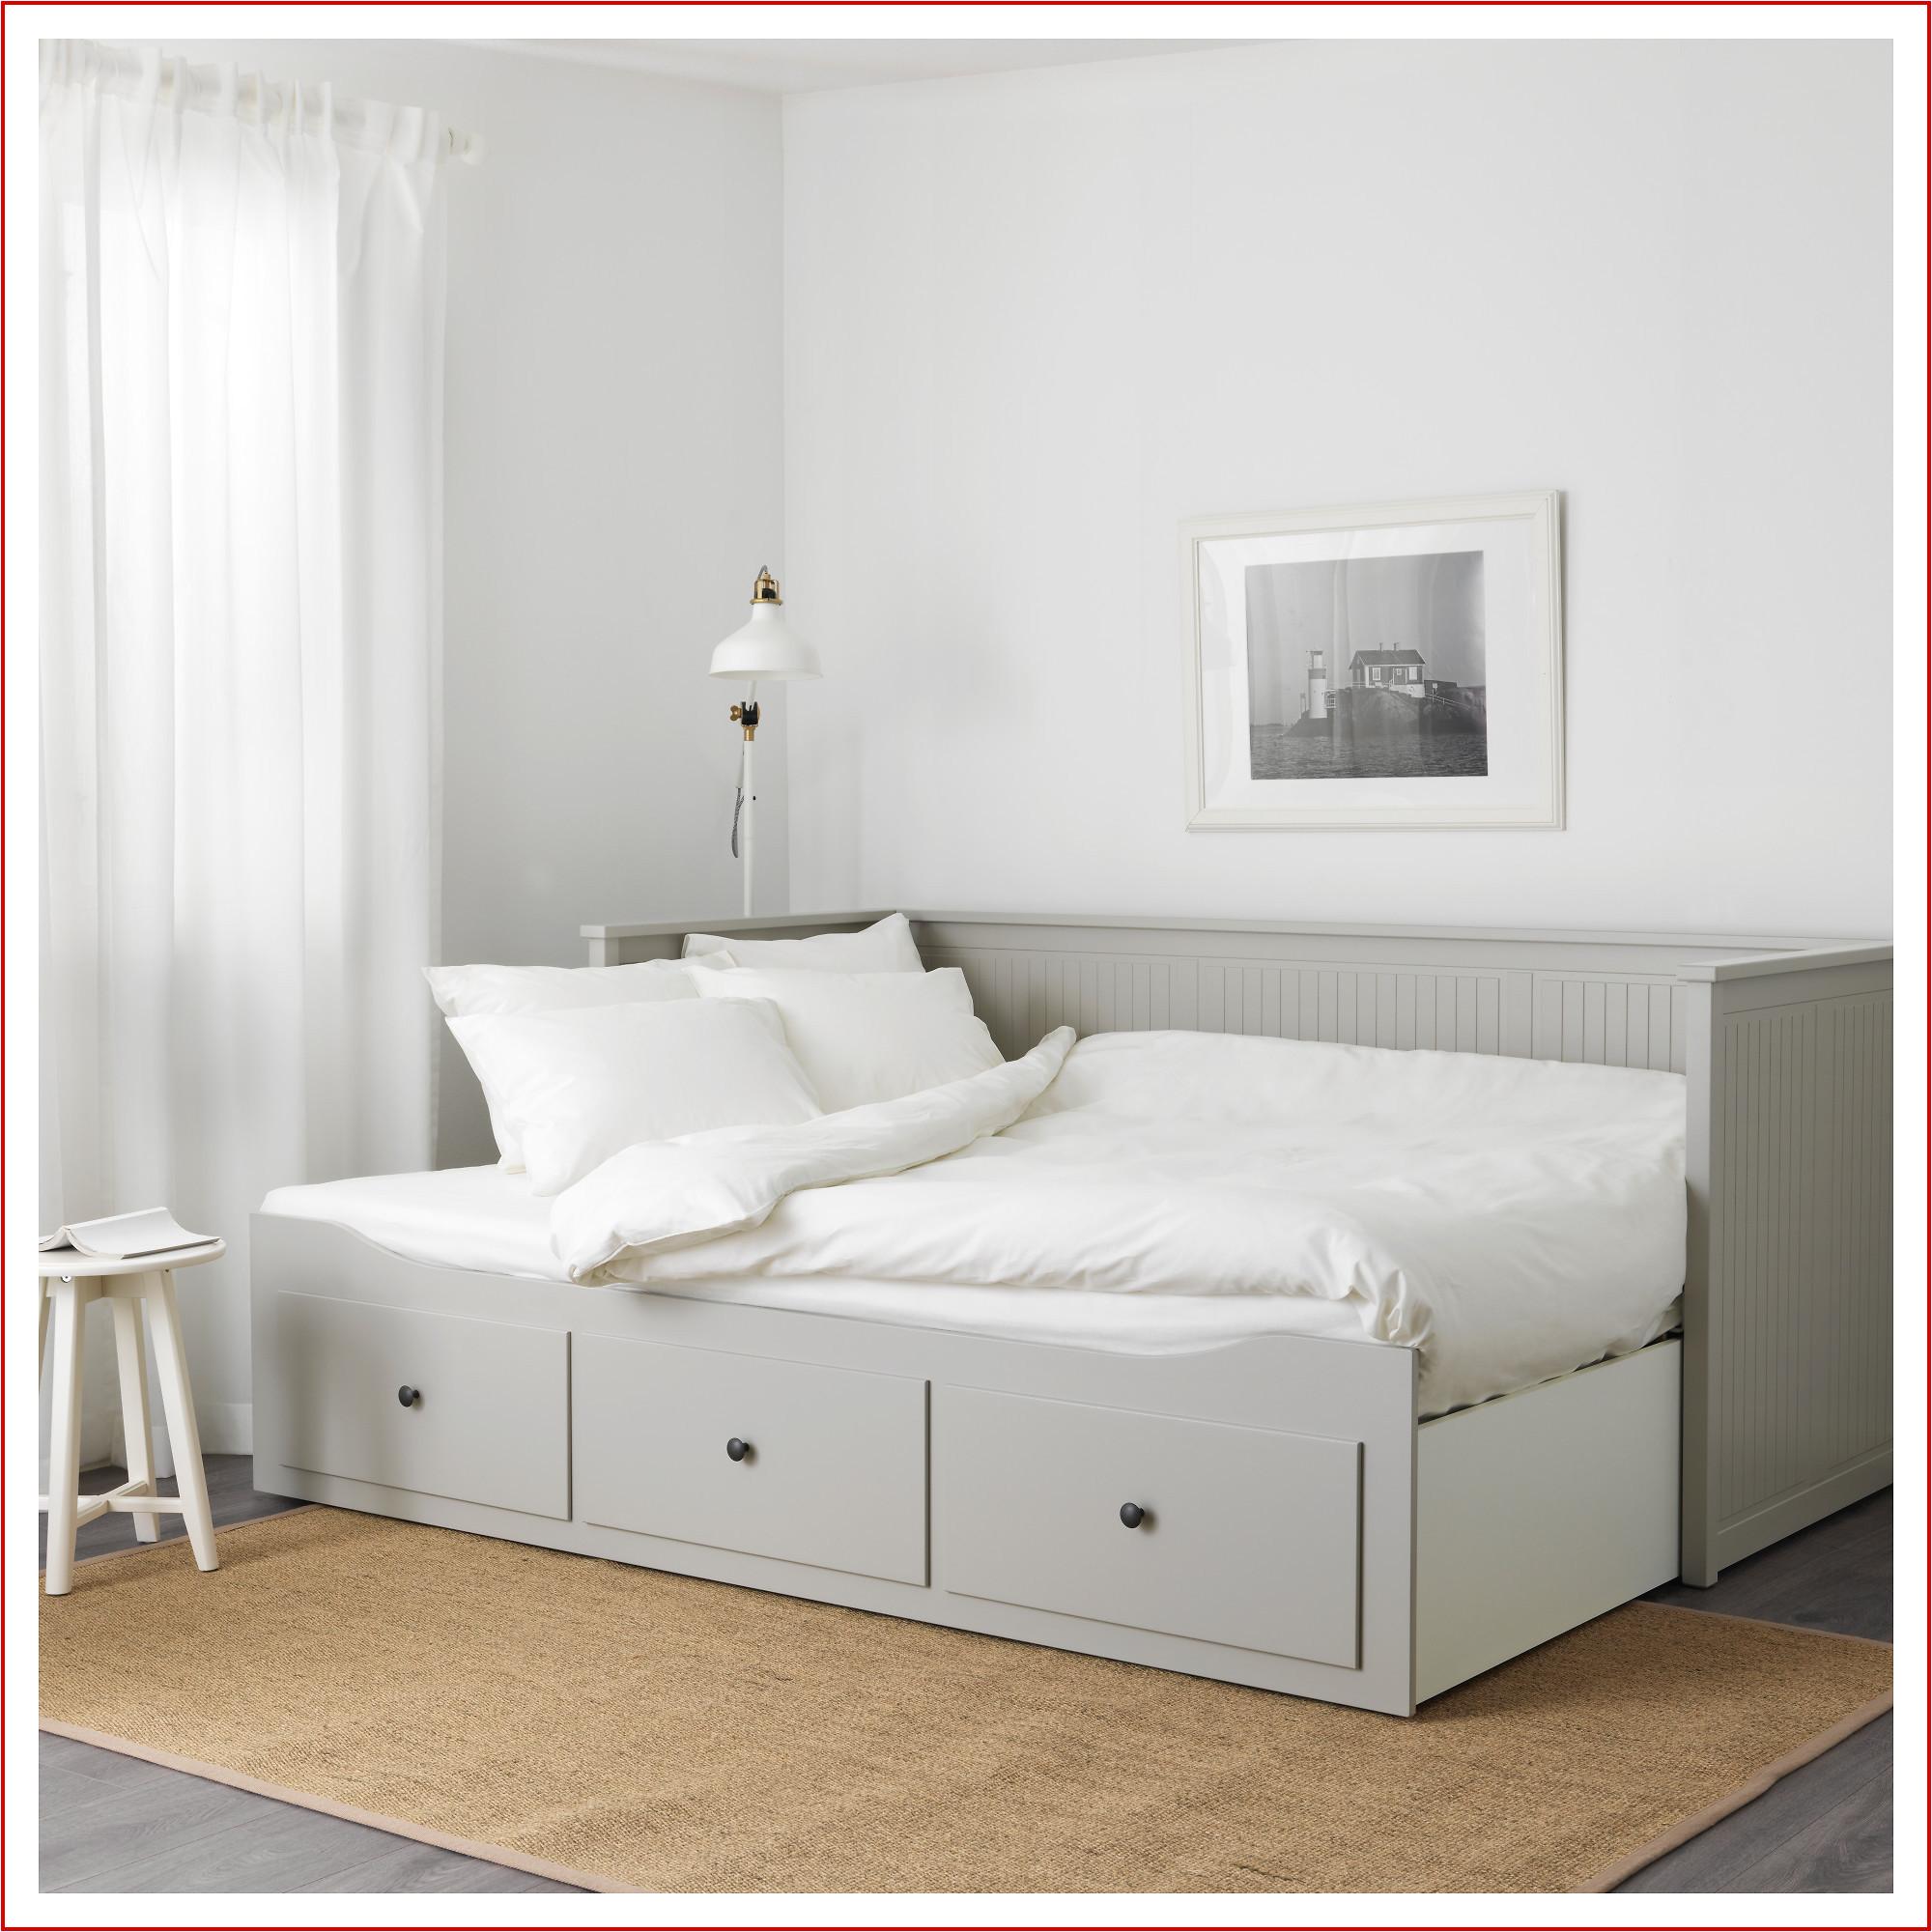 Ikea Hemnes Day Bed Instruction Manual Hemnes Bett 424040 Ikea Hemnes Bett Grau Kerwinso Com